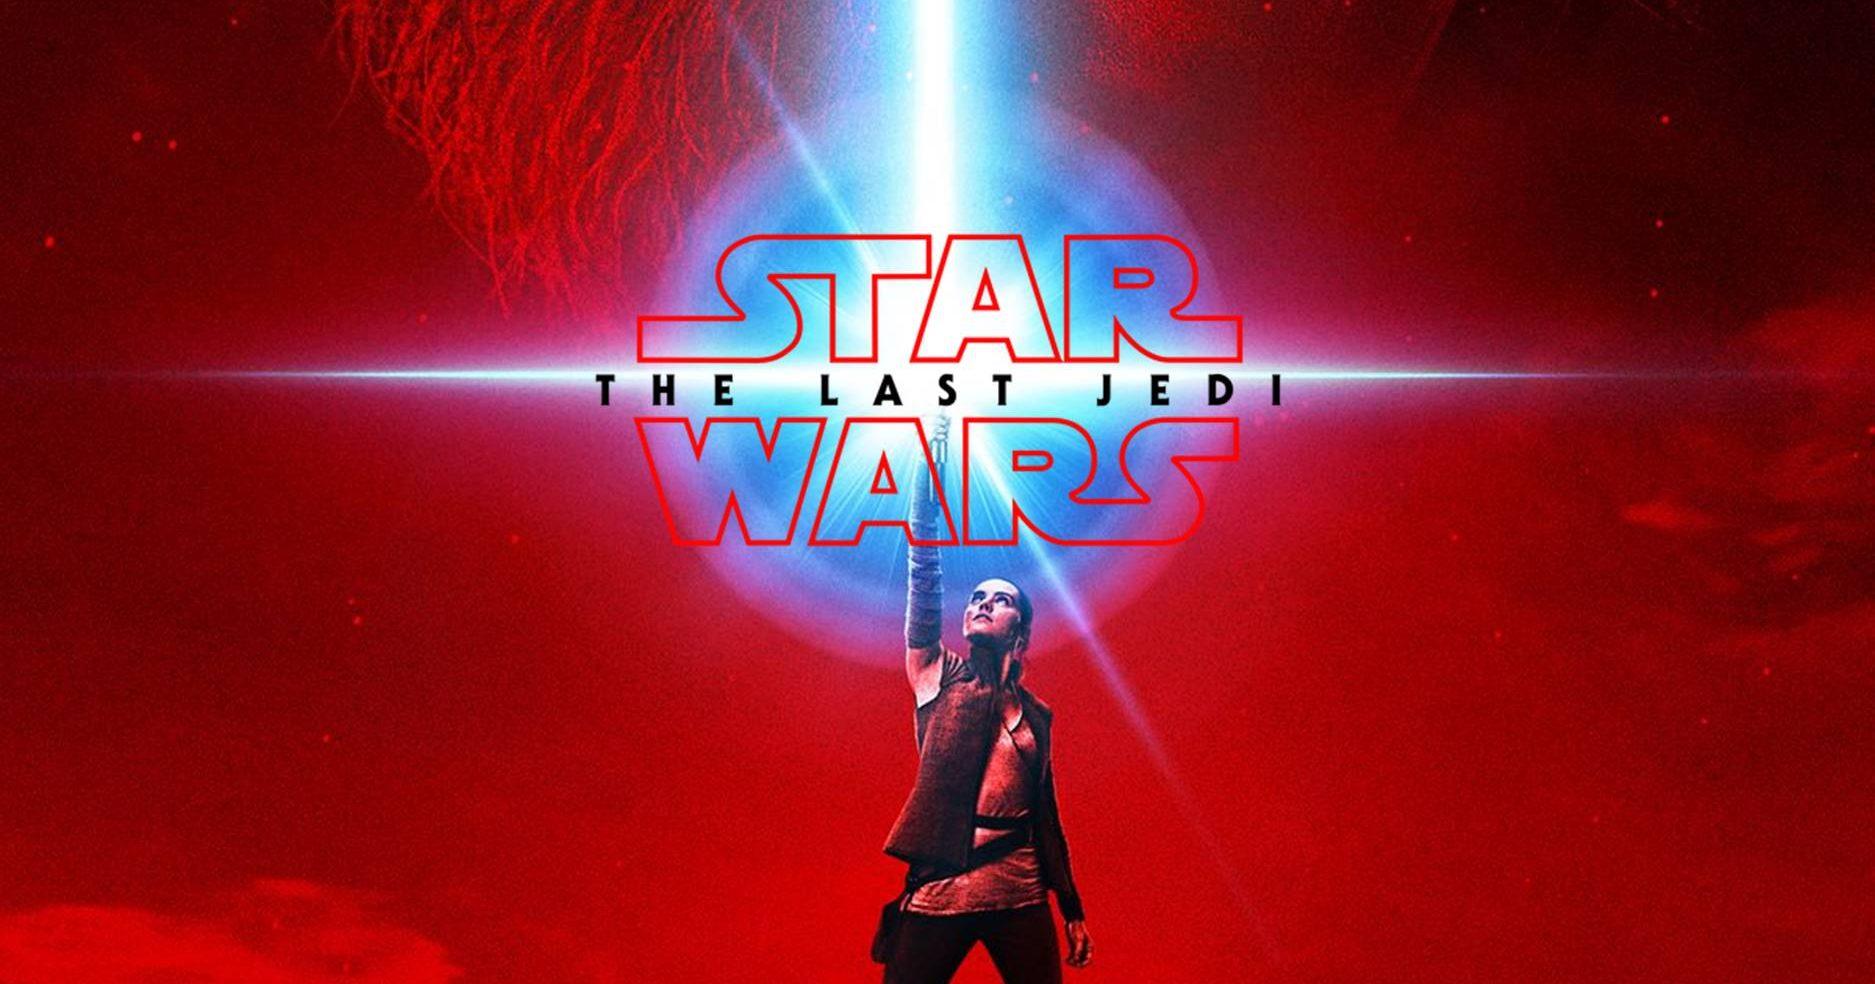 star-wars-the-last-jedi-episode-viii-8-banner-e1492210714771.jpg